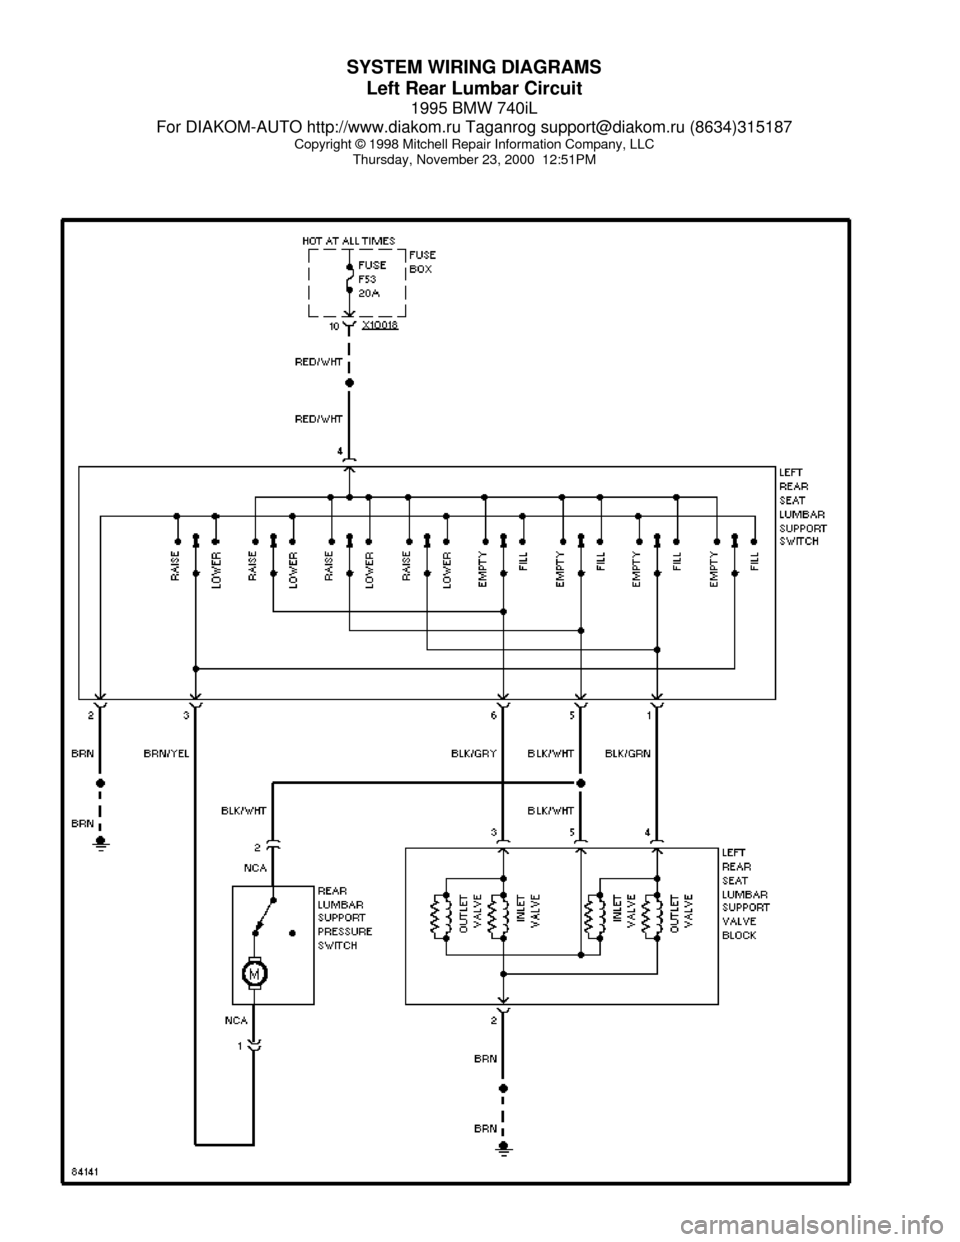 medium resolution of e38 fuse box diagram bmw fuse diagram fuse in circuit diagram e38 trunk fuse box diagram